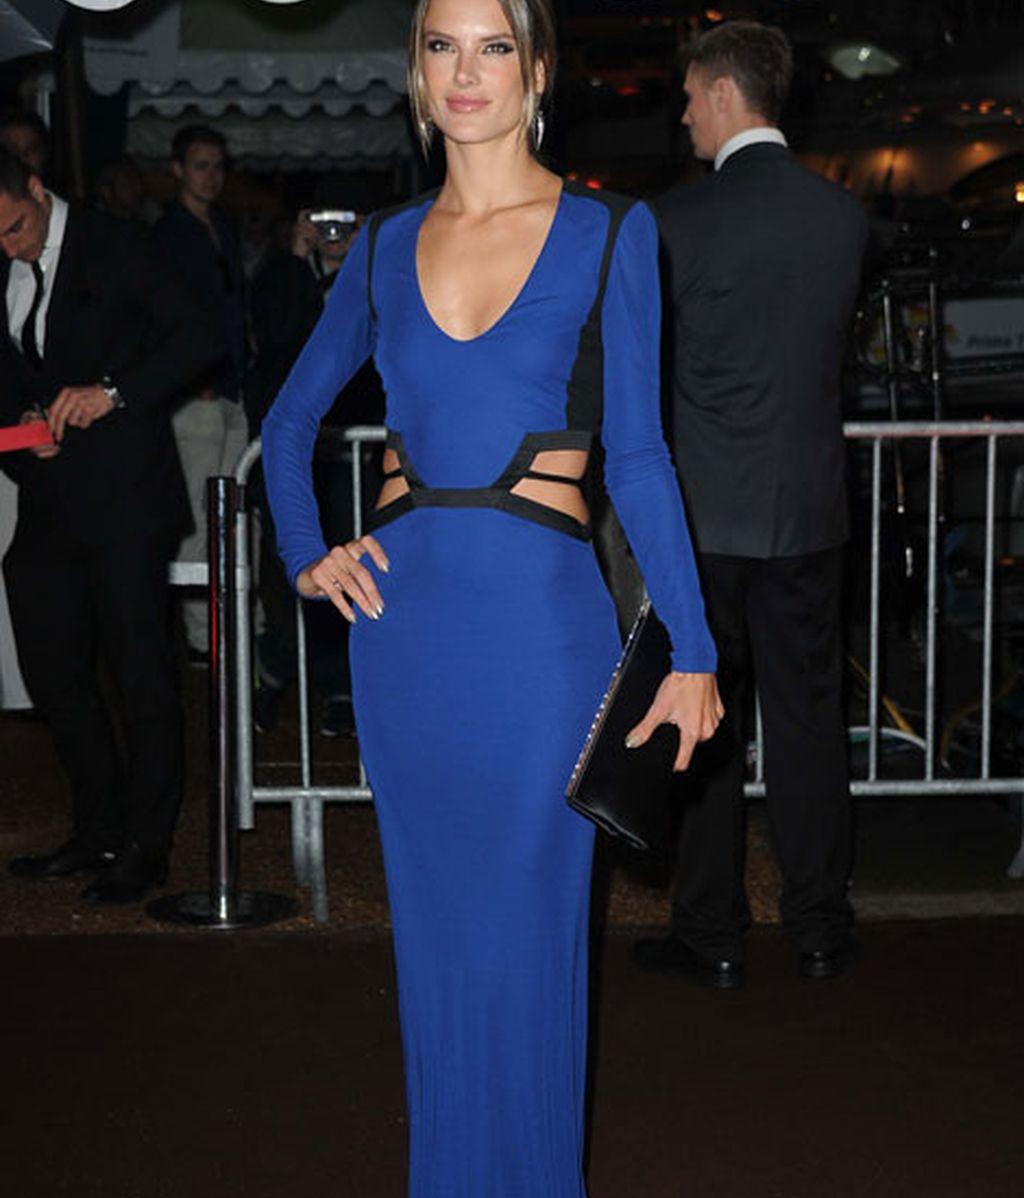 Alessandra Ambrosio, espectacular con un vestido azul klein